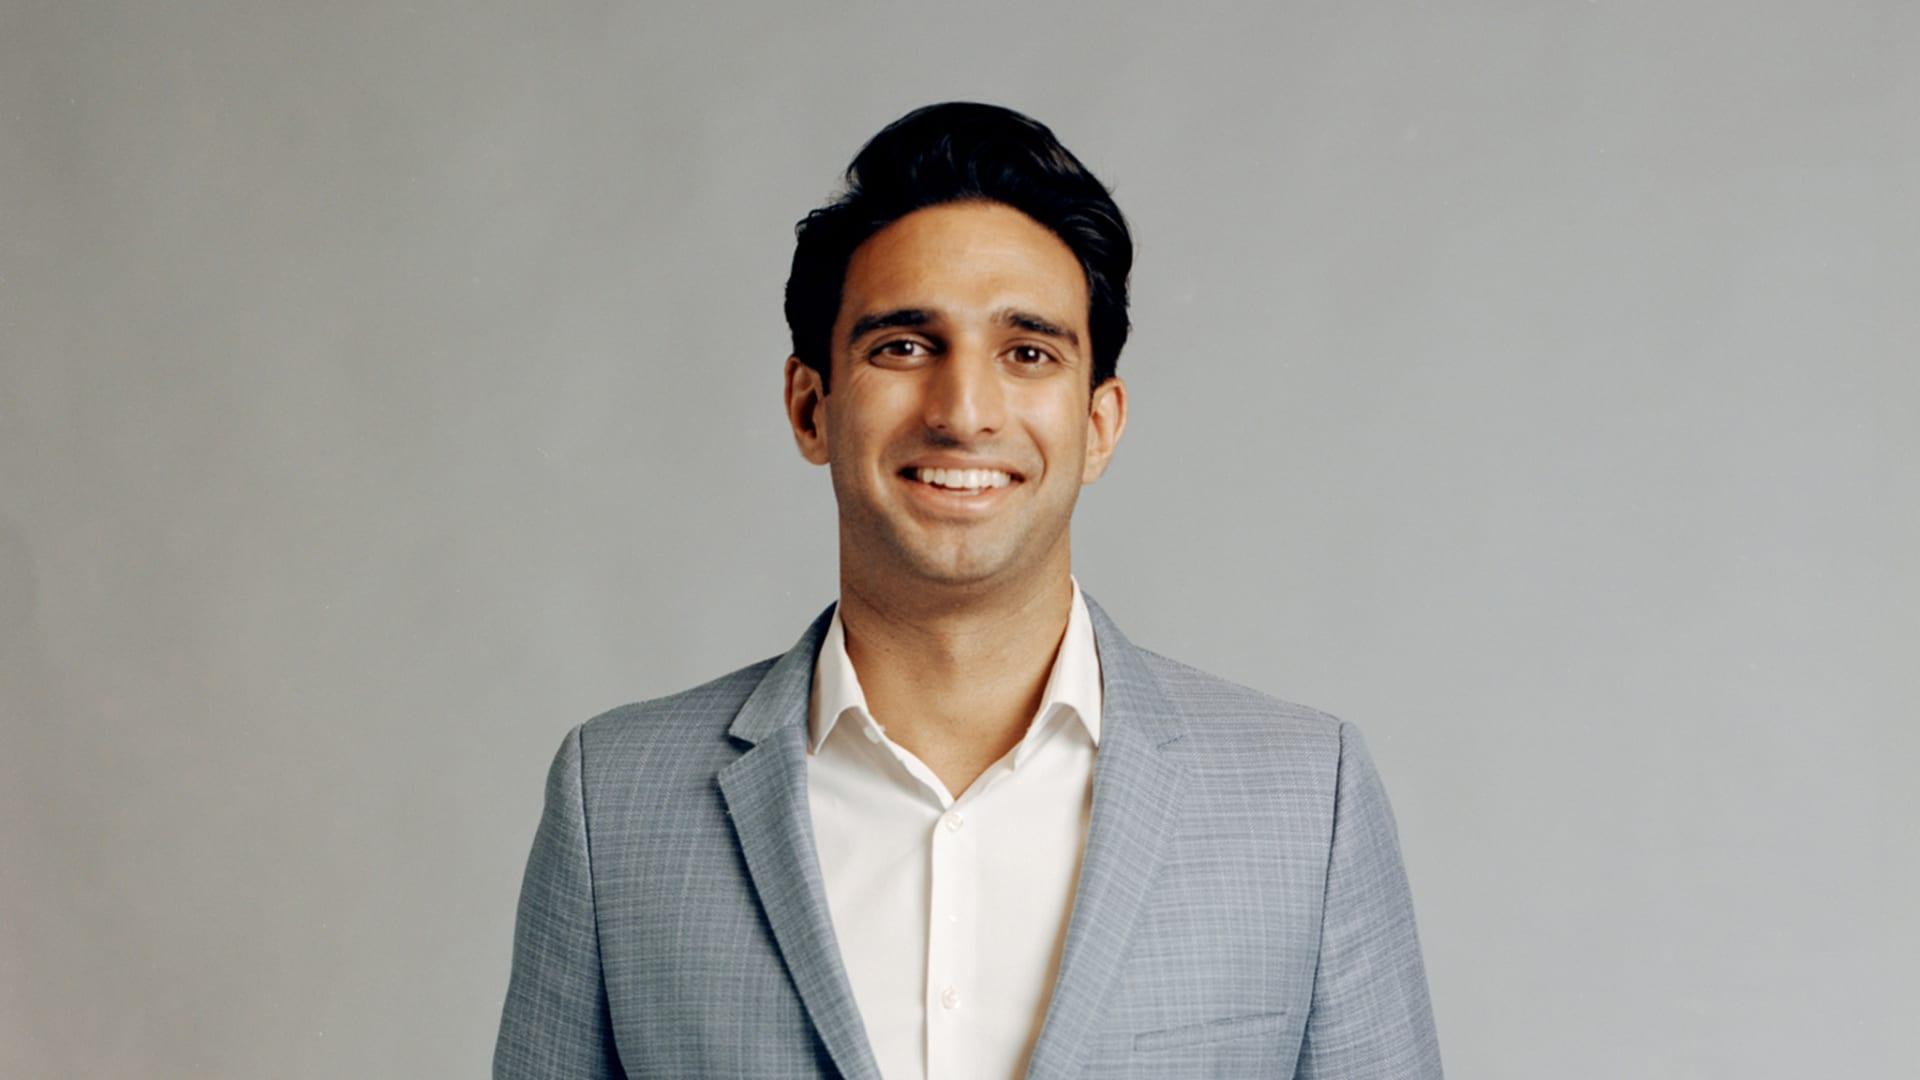 Kabir Barday, founder of OneTrust.